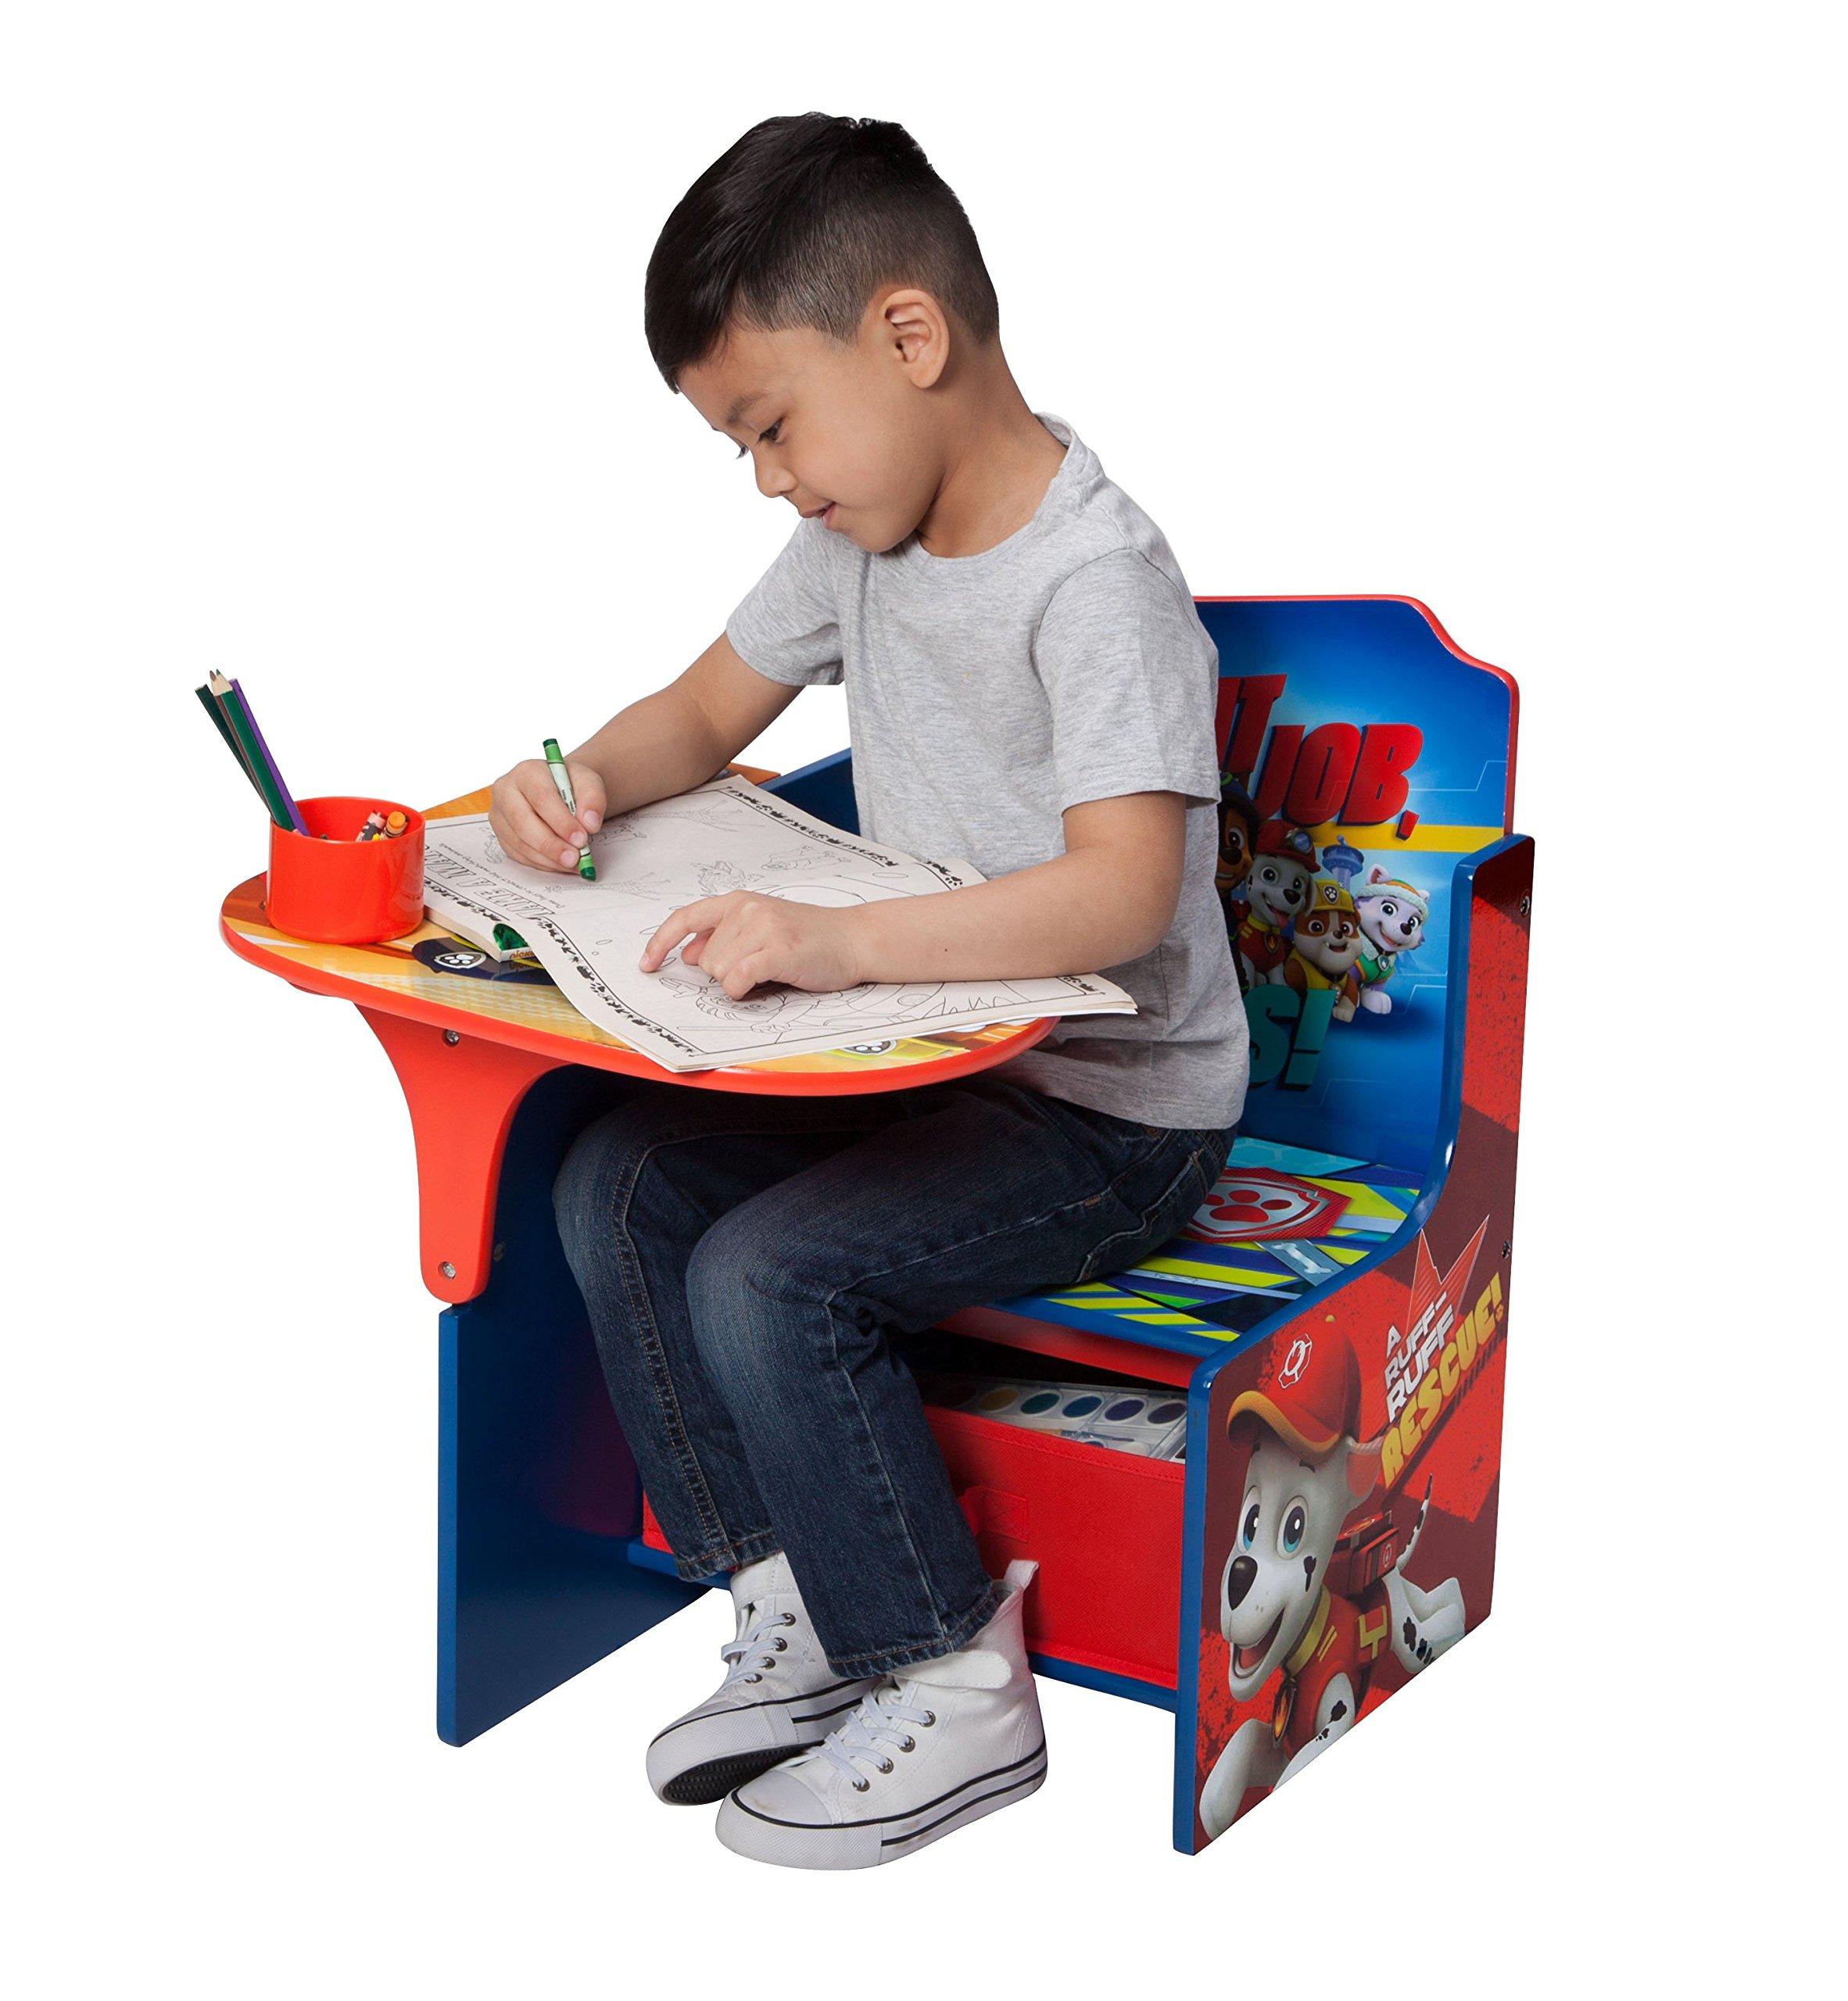 Delta Children Chair Desk with Storage Bin – Ideal for Arts & Crafts, Snack Time, Homeschooling, Homework & More, Nick…